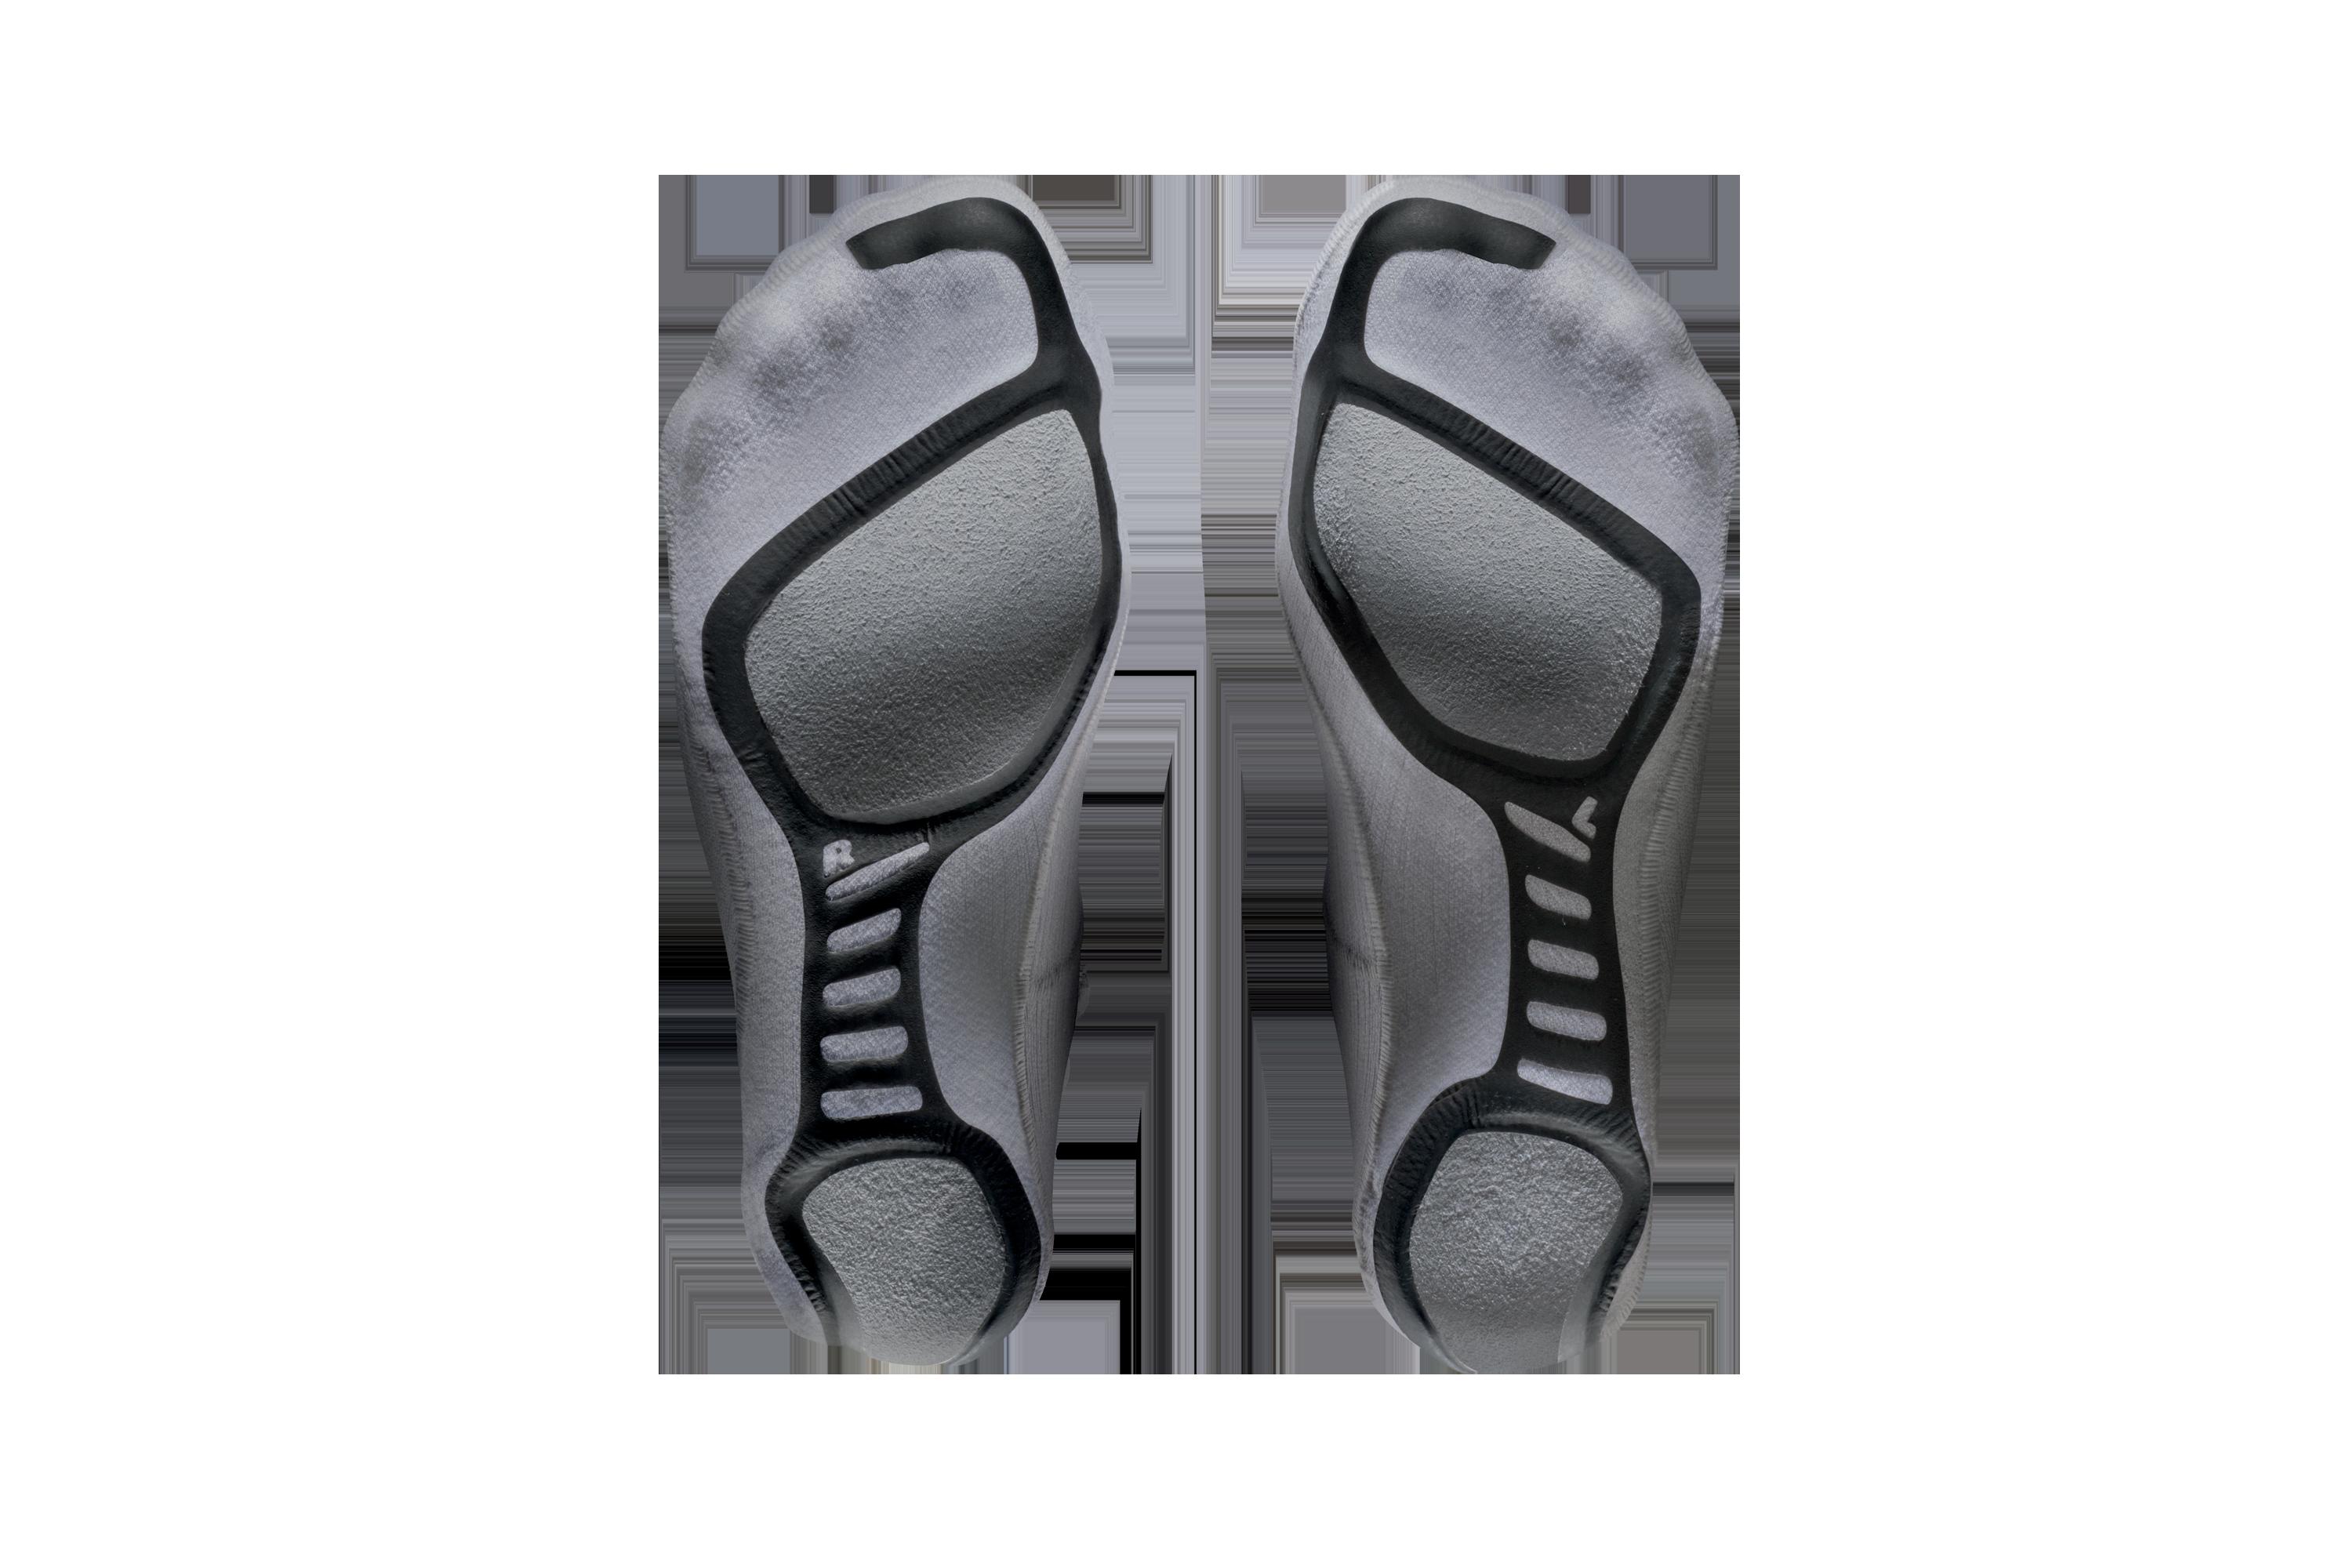 Storelli SpeedGrip Socks